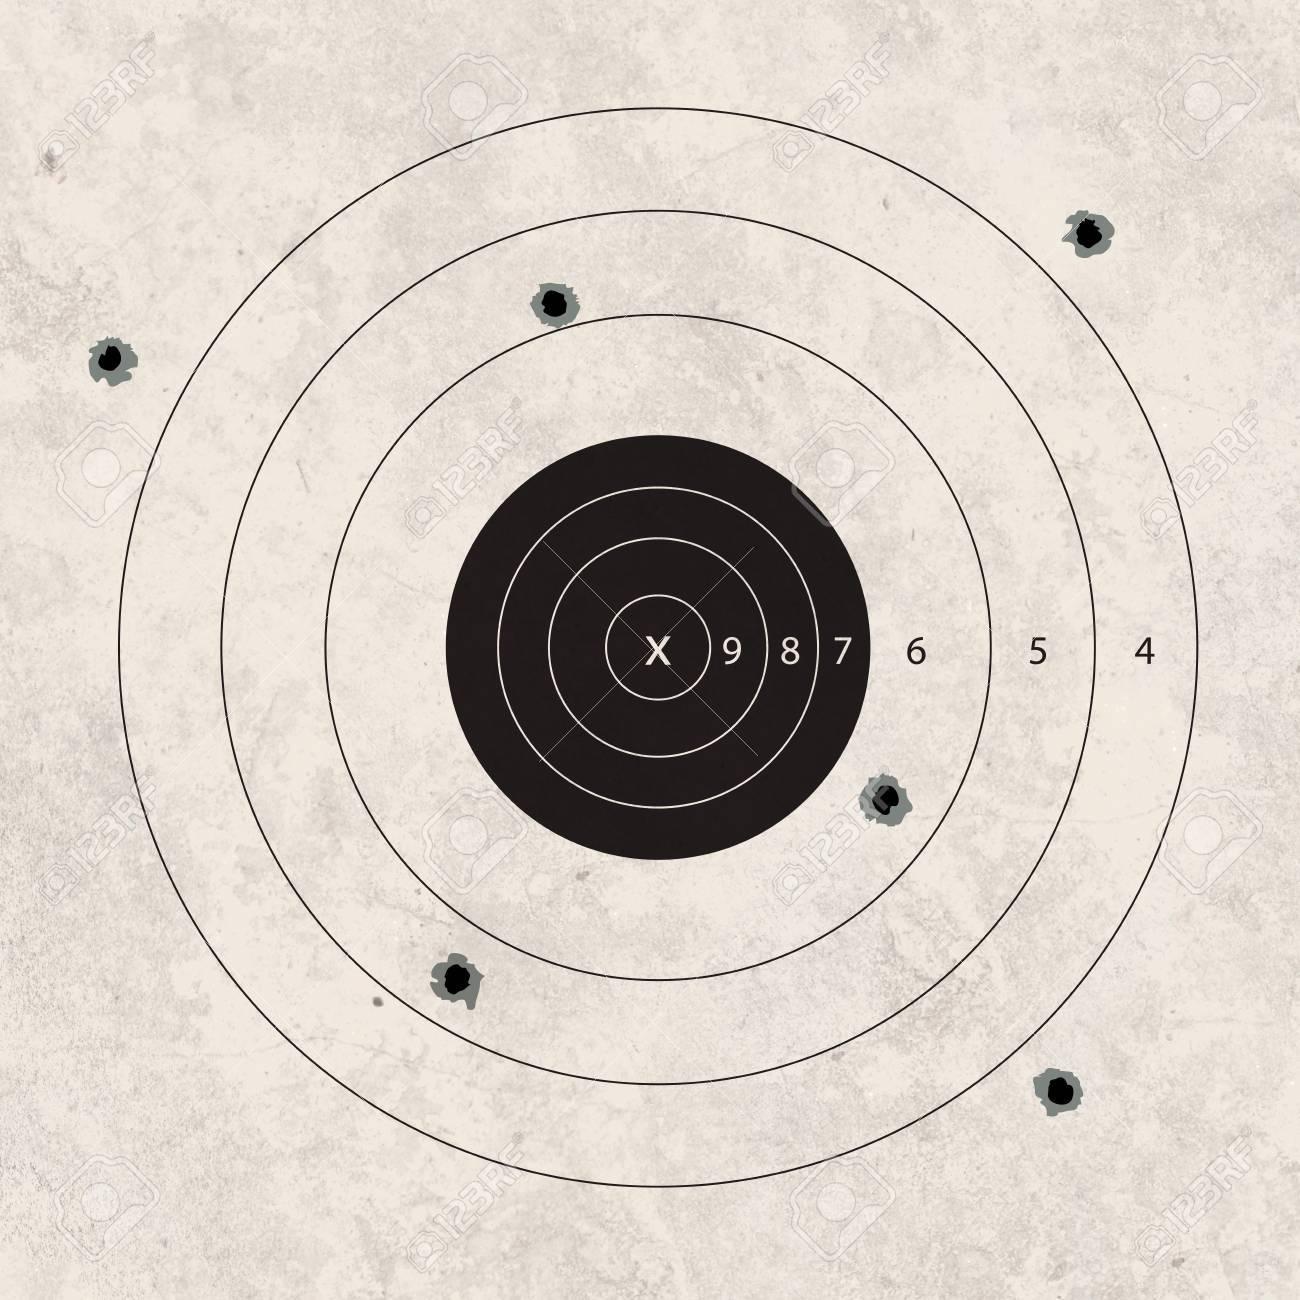 gun shoot to the shooting target concept - 21940978